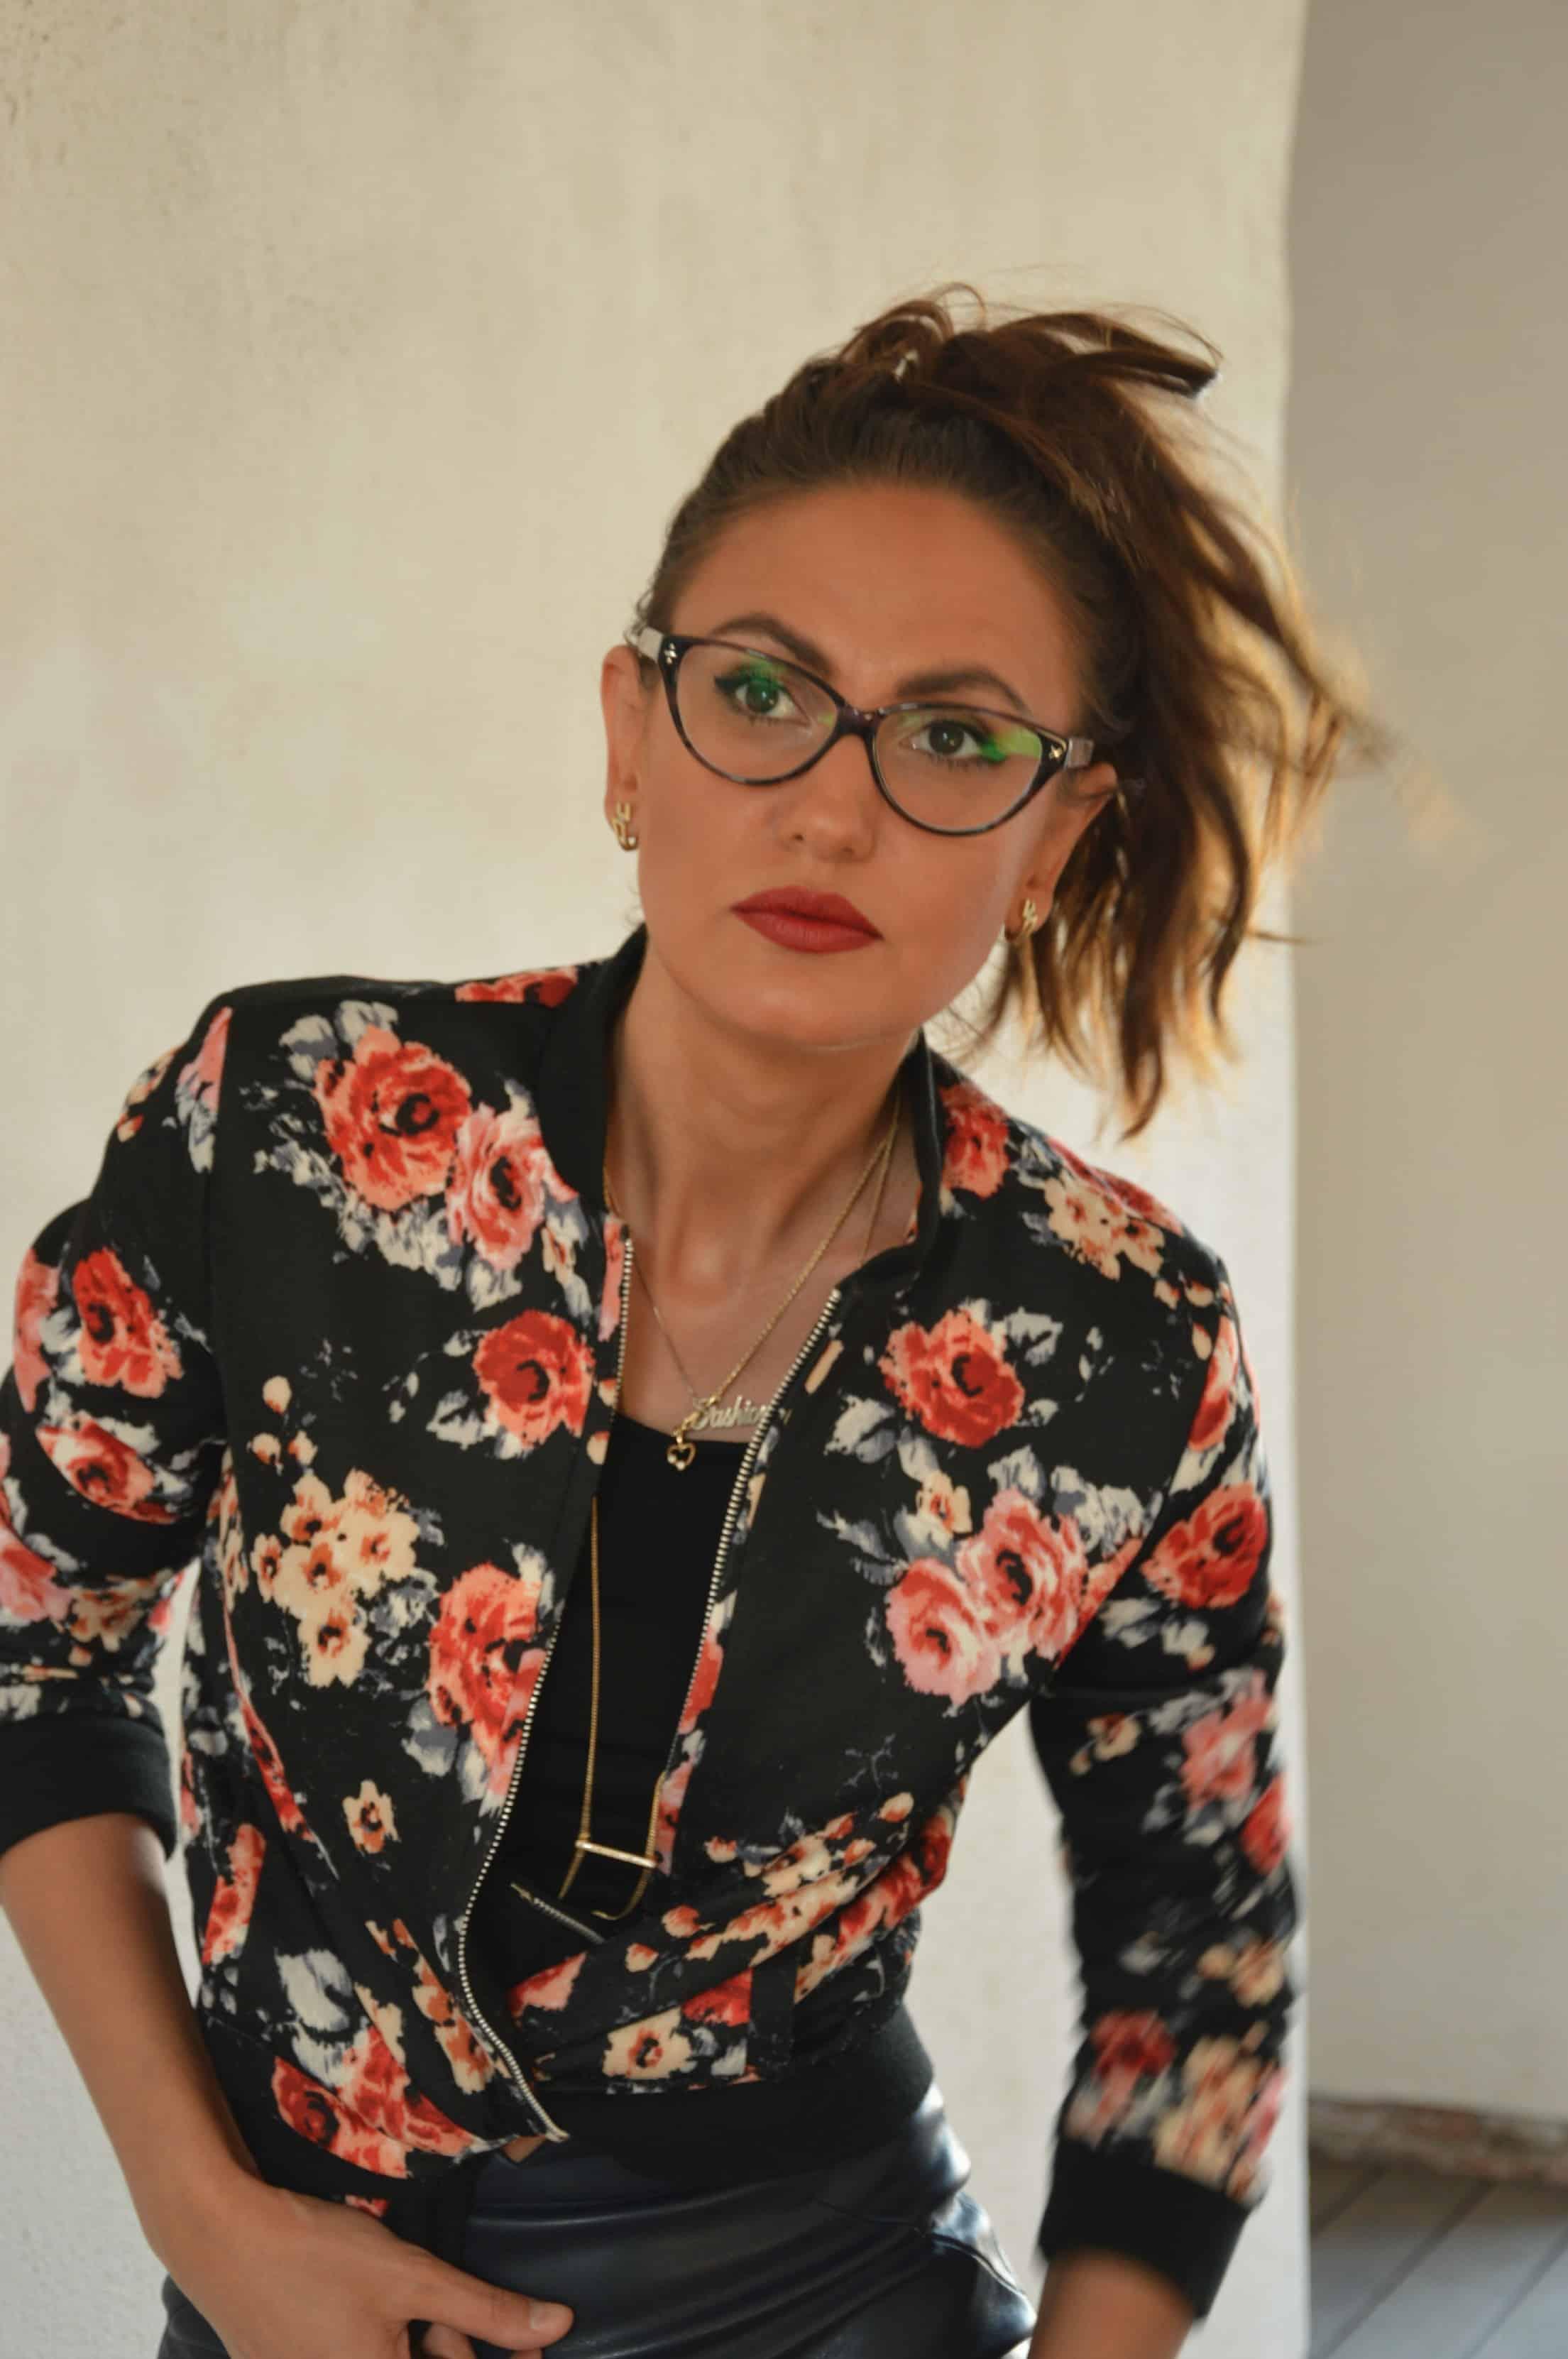 lensway-eyewear-derek-cardigan-glasses-thefashiontag-look-3